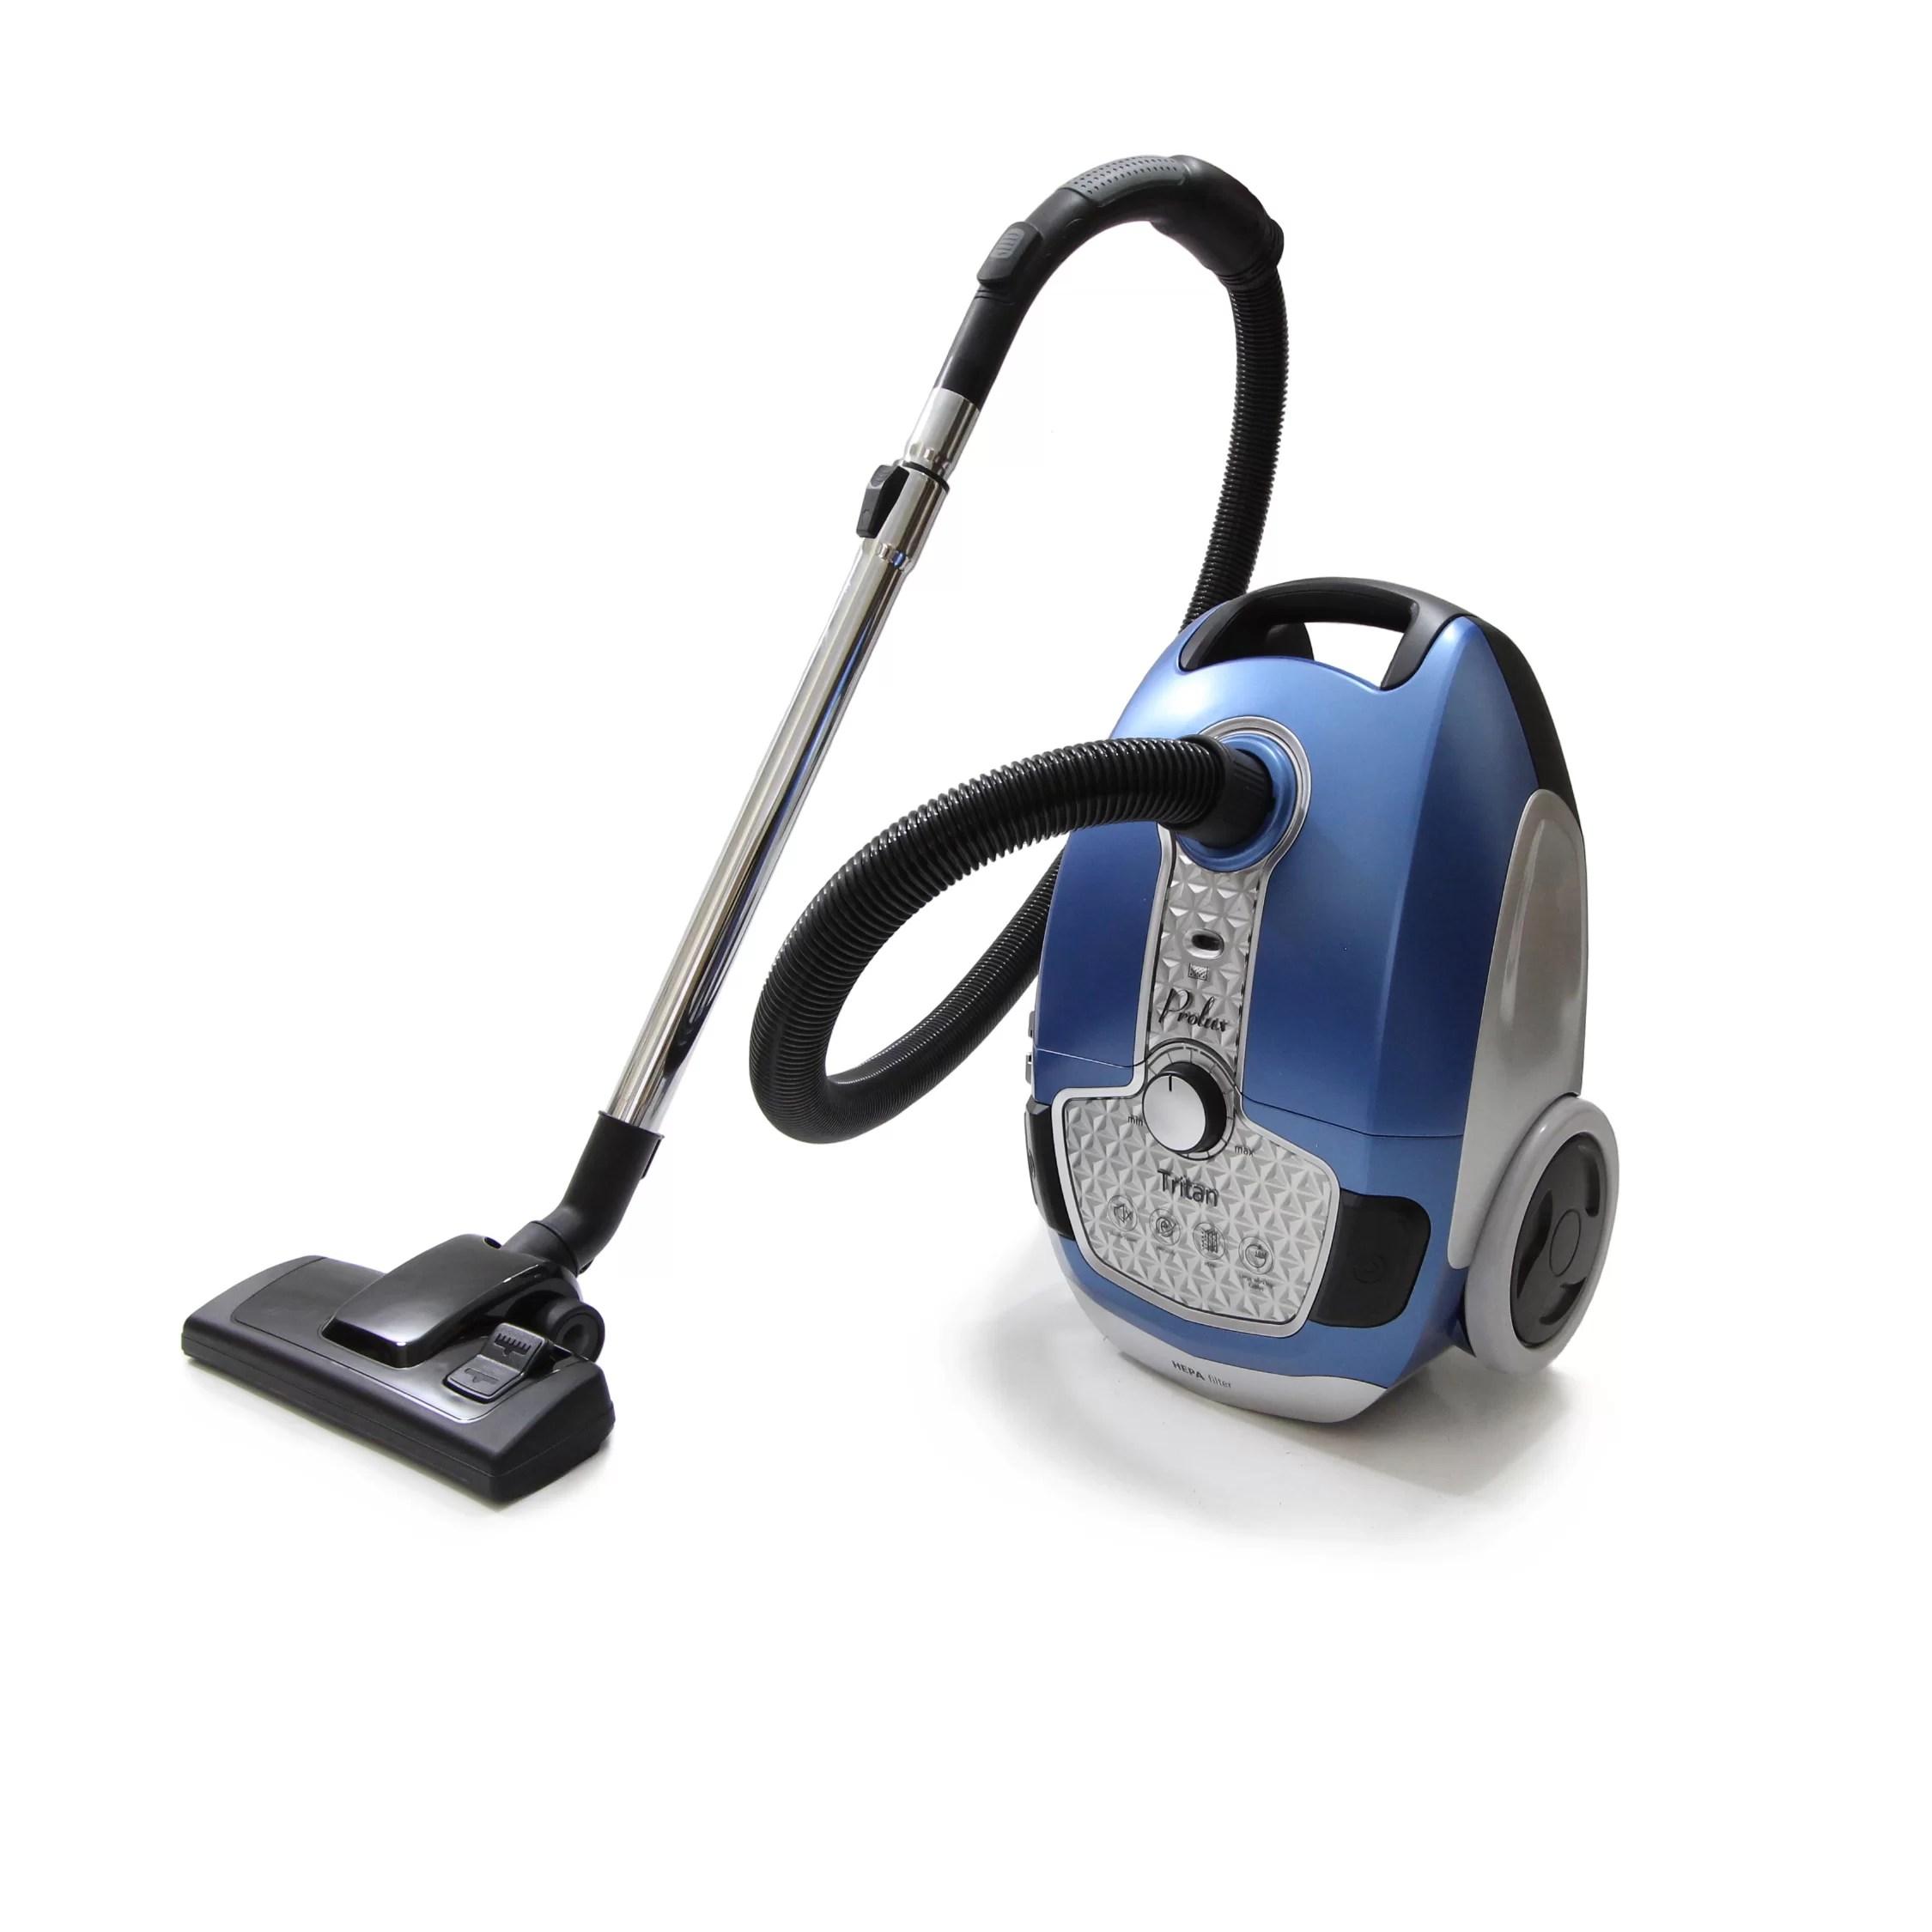 ProLux Prolux Tritan Pet Turbo Canister Vacuum Cleaner HEPA Sealed Hard Floor Vacuum  Reviews